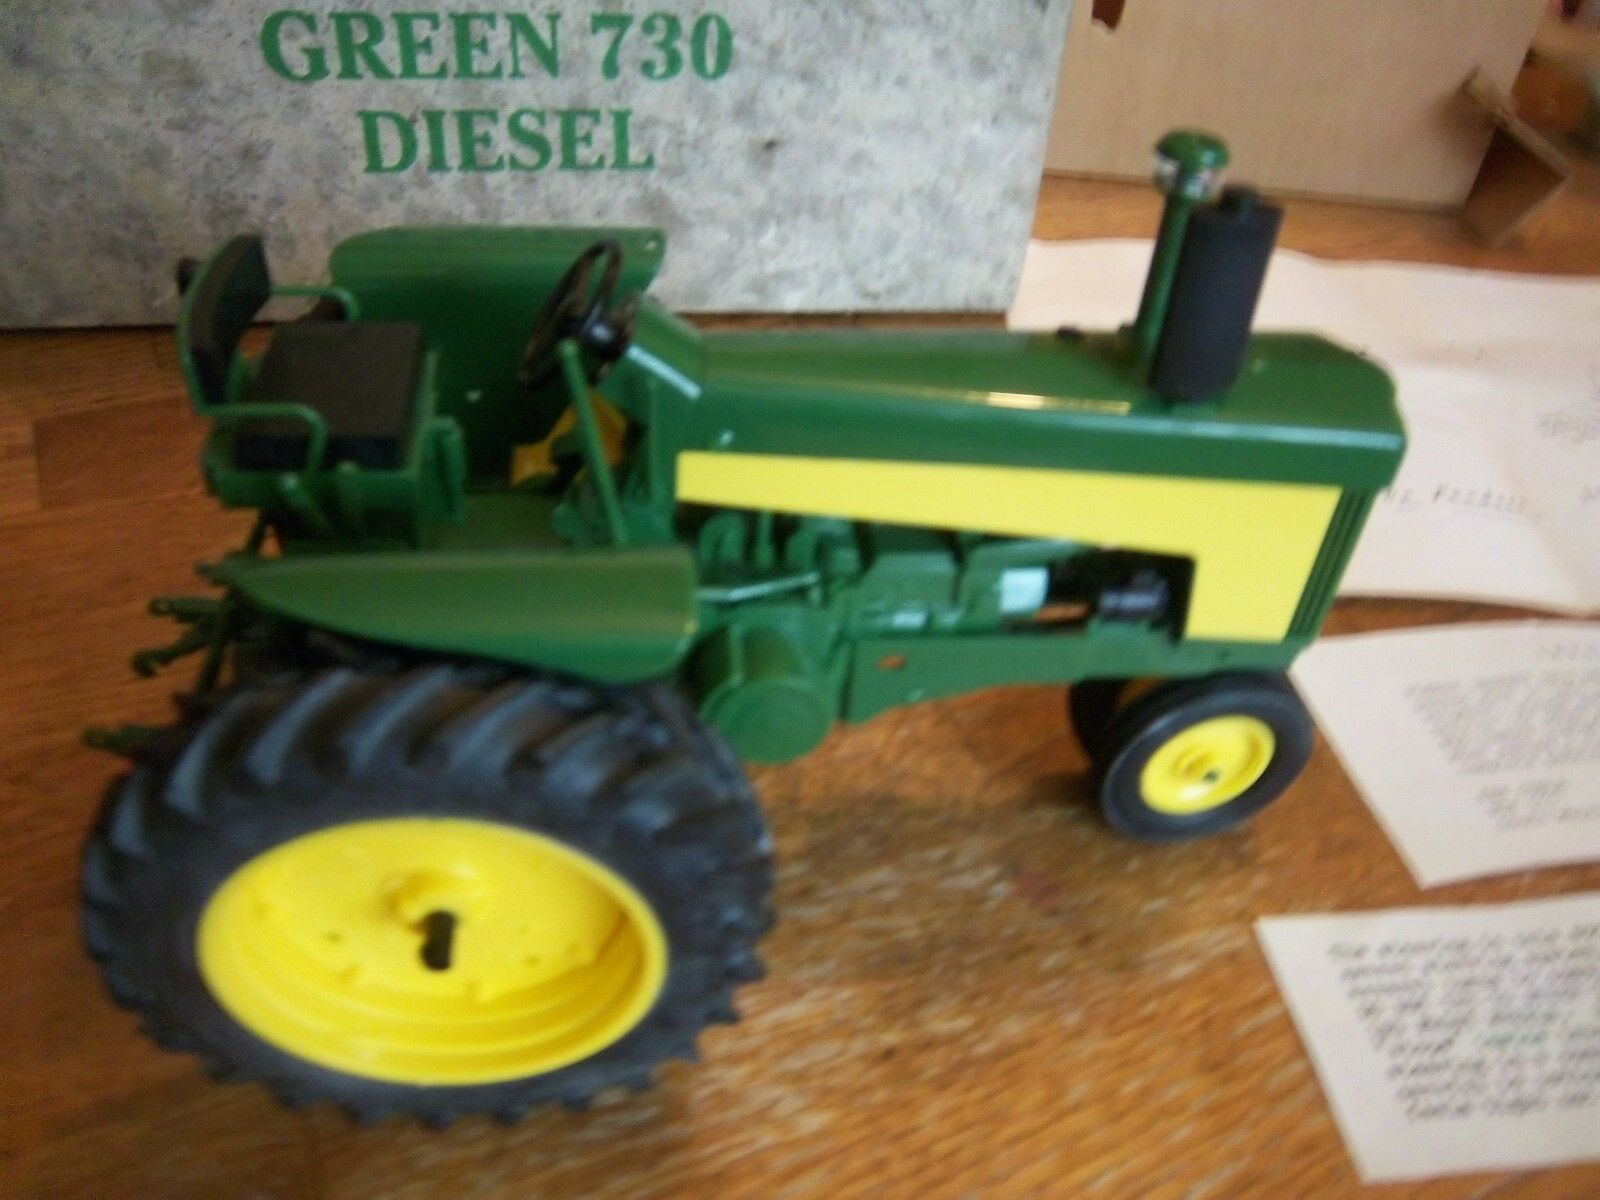 John Deere 730 Lafayette Show Tractor 1987 Spec. Edtn. Edtn. Edtn. by Yoder in 1 16th scale 55868d